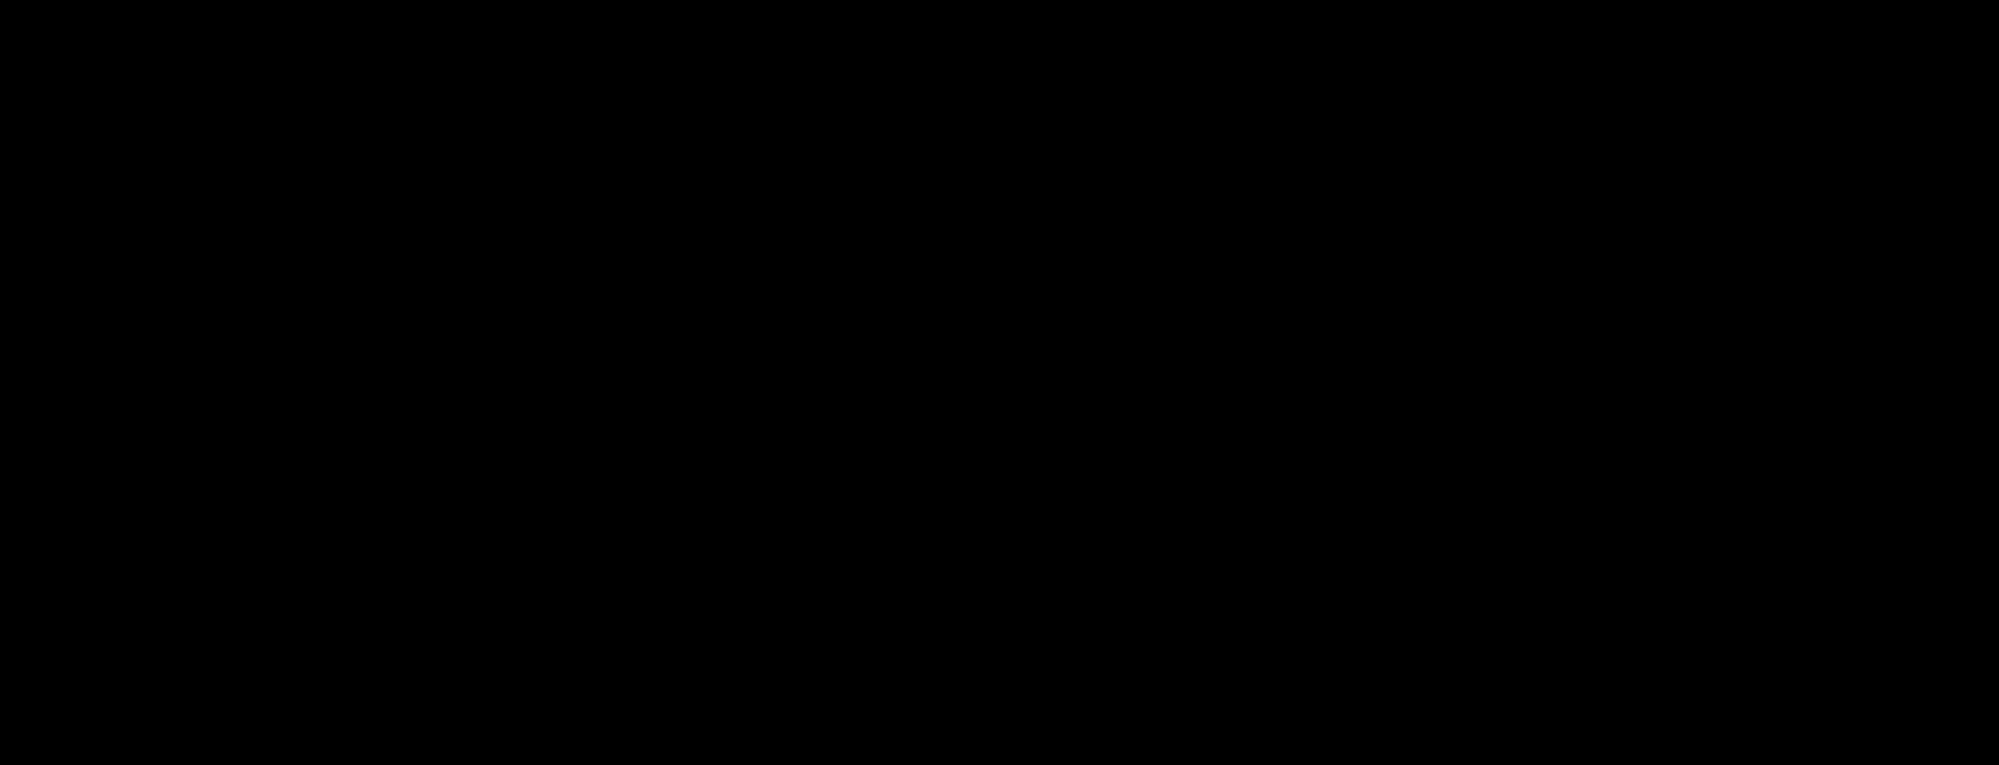 Suricato